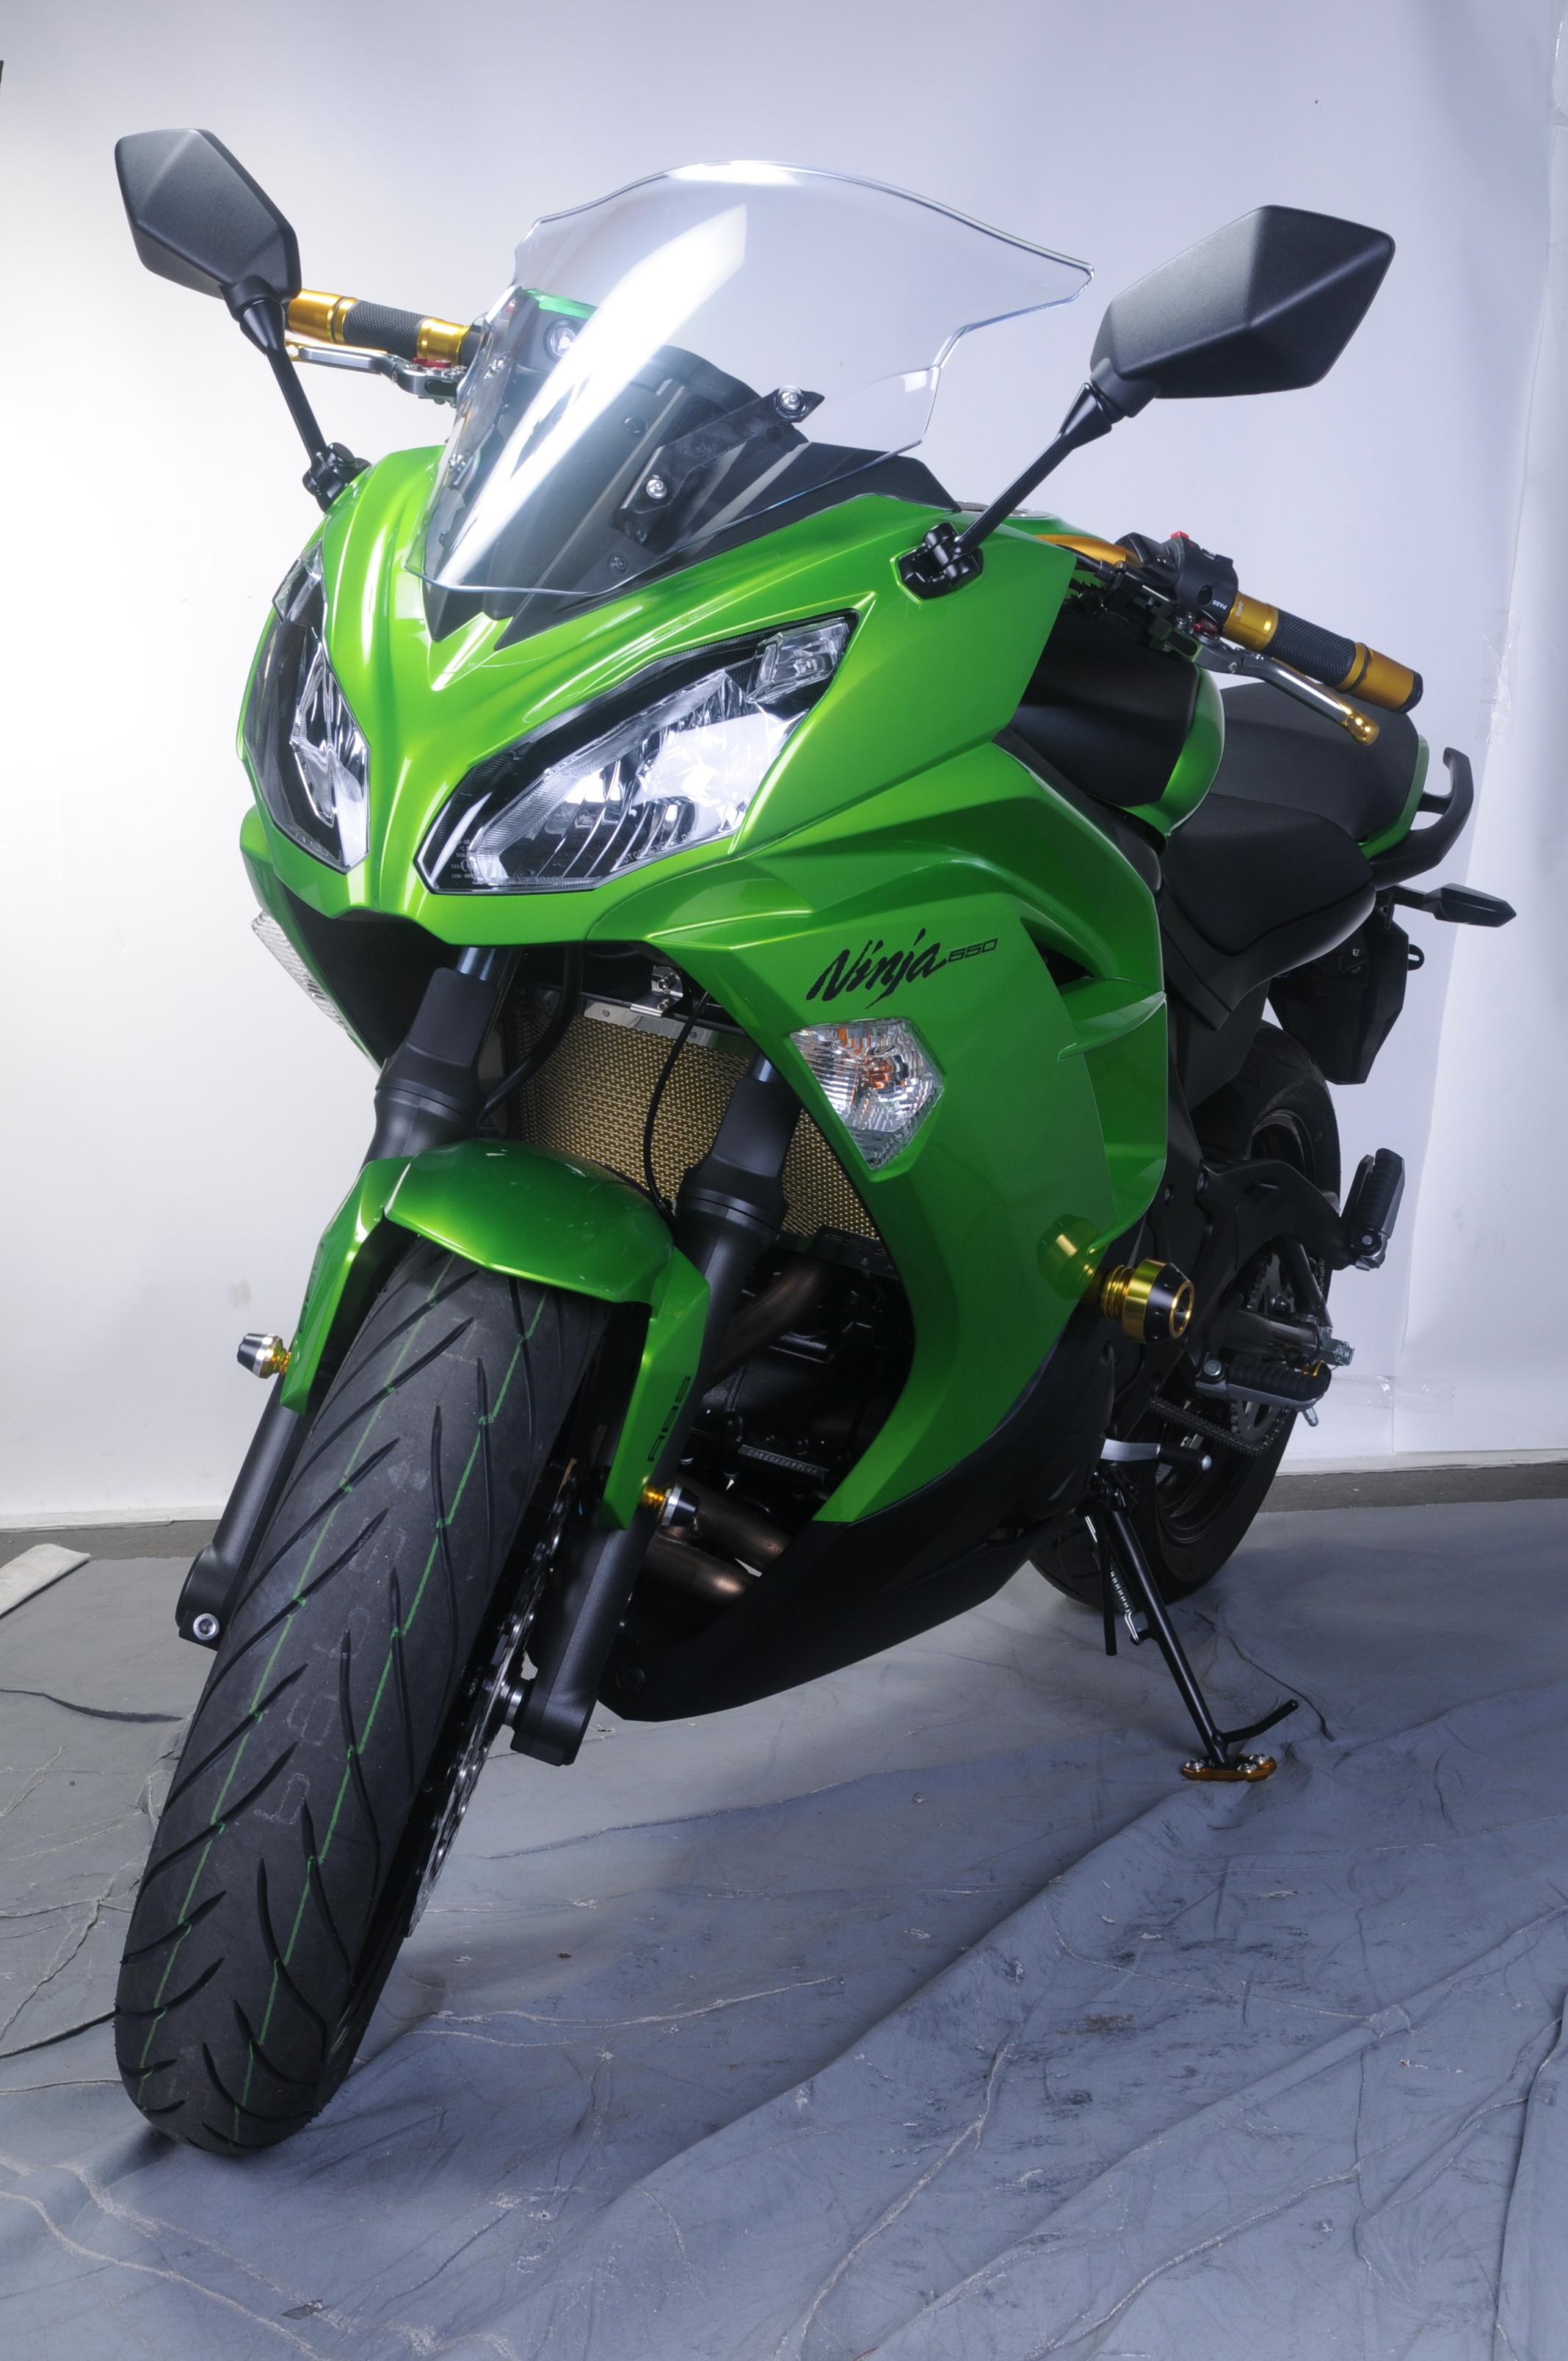 ER-6N PICs - Page 2 - KawiForums - Kawasaki Motorcycle Forums